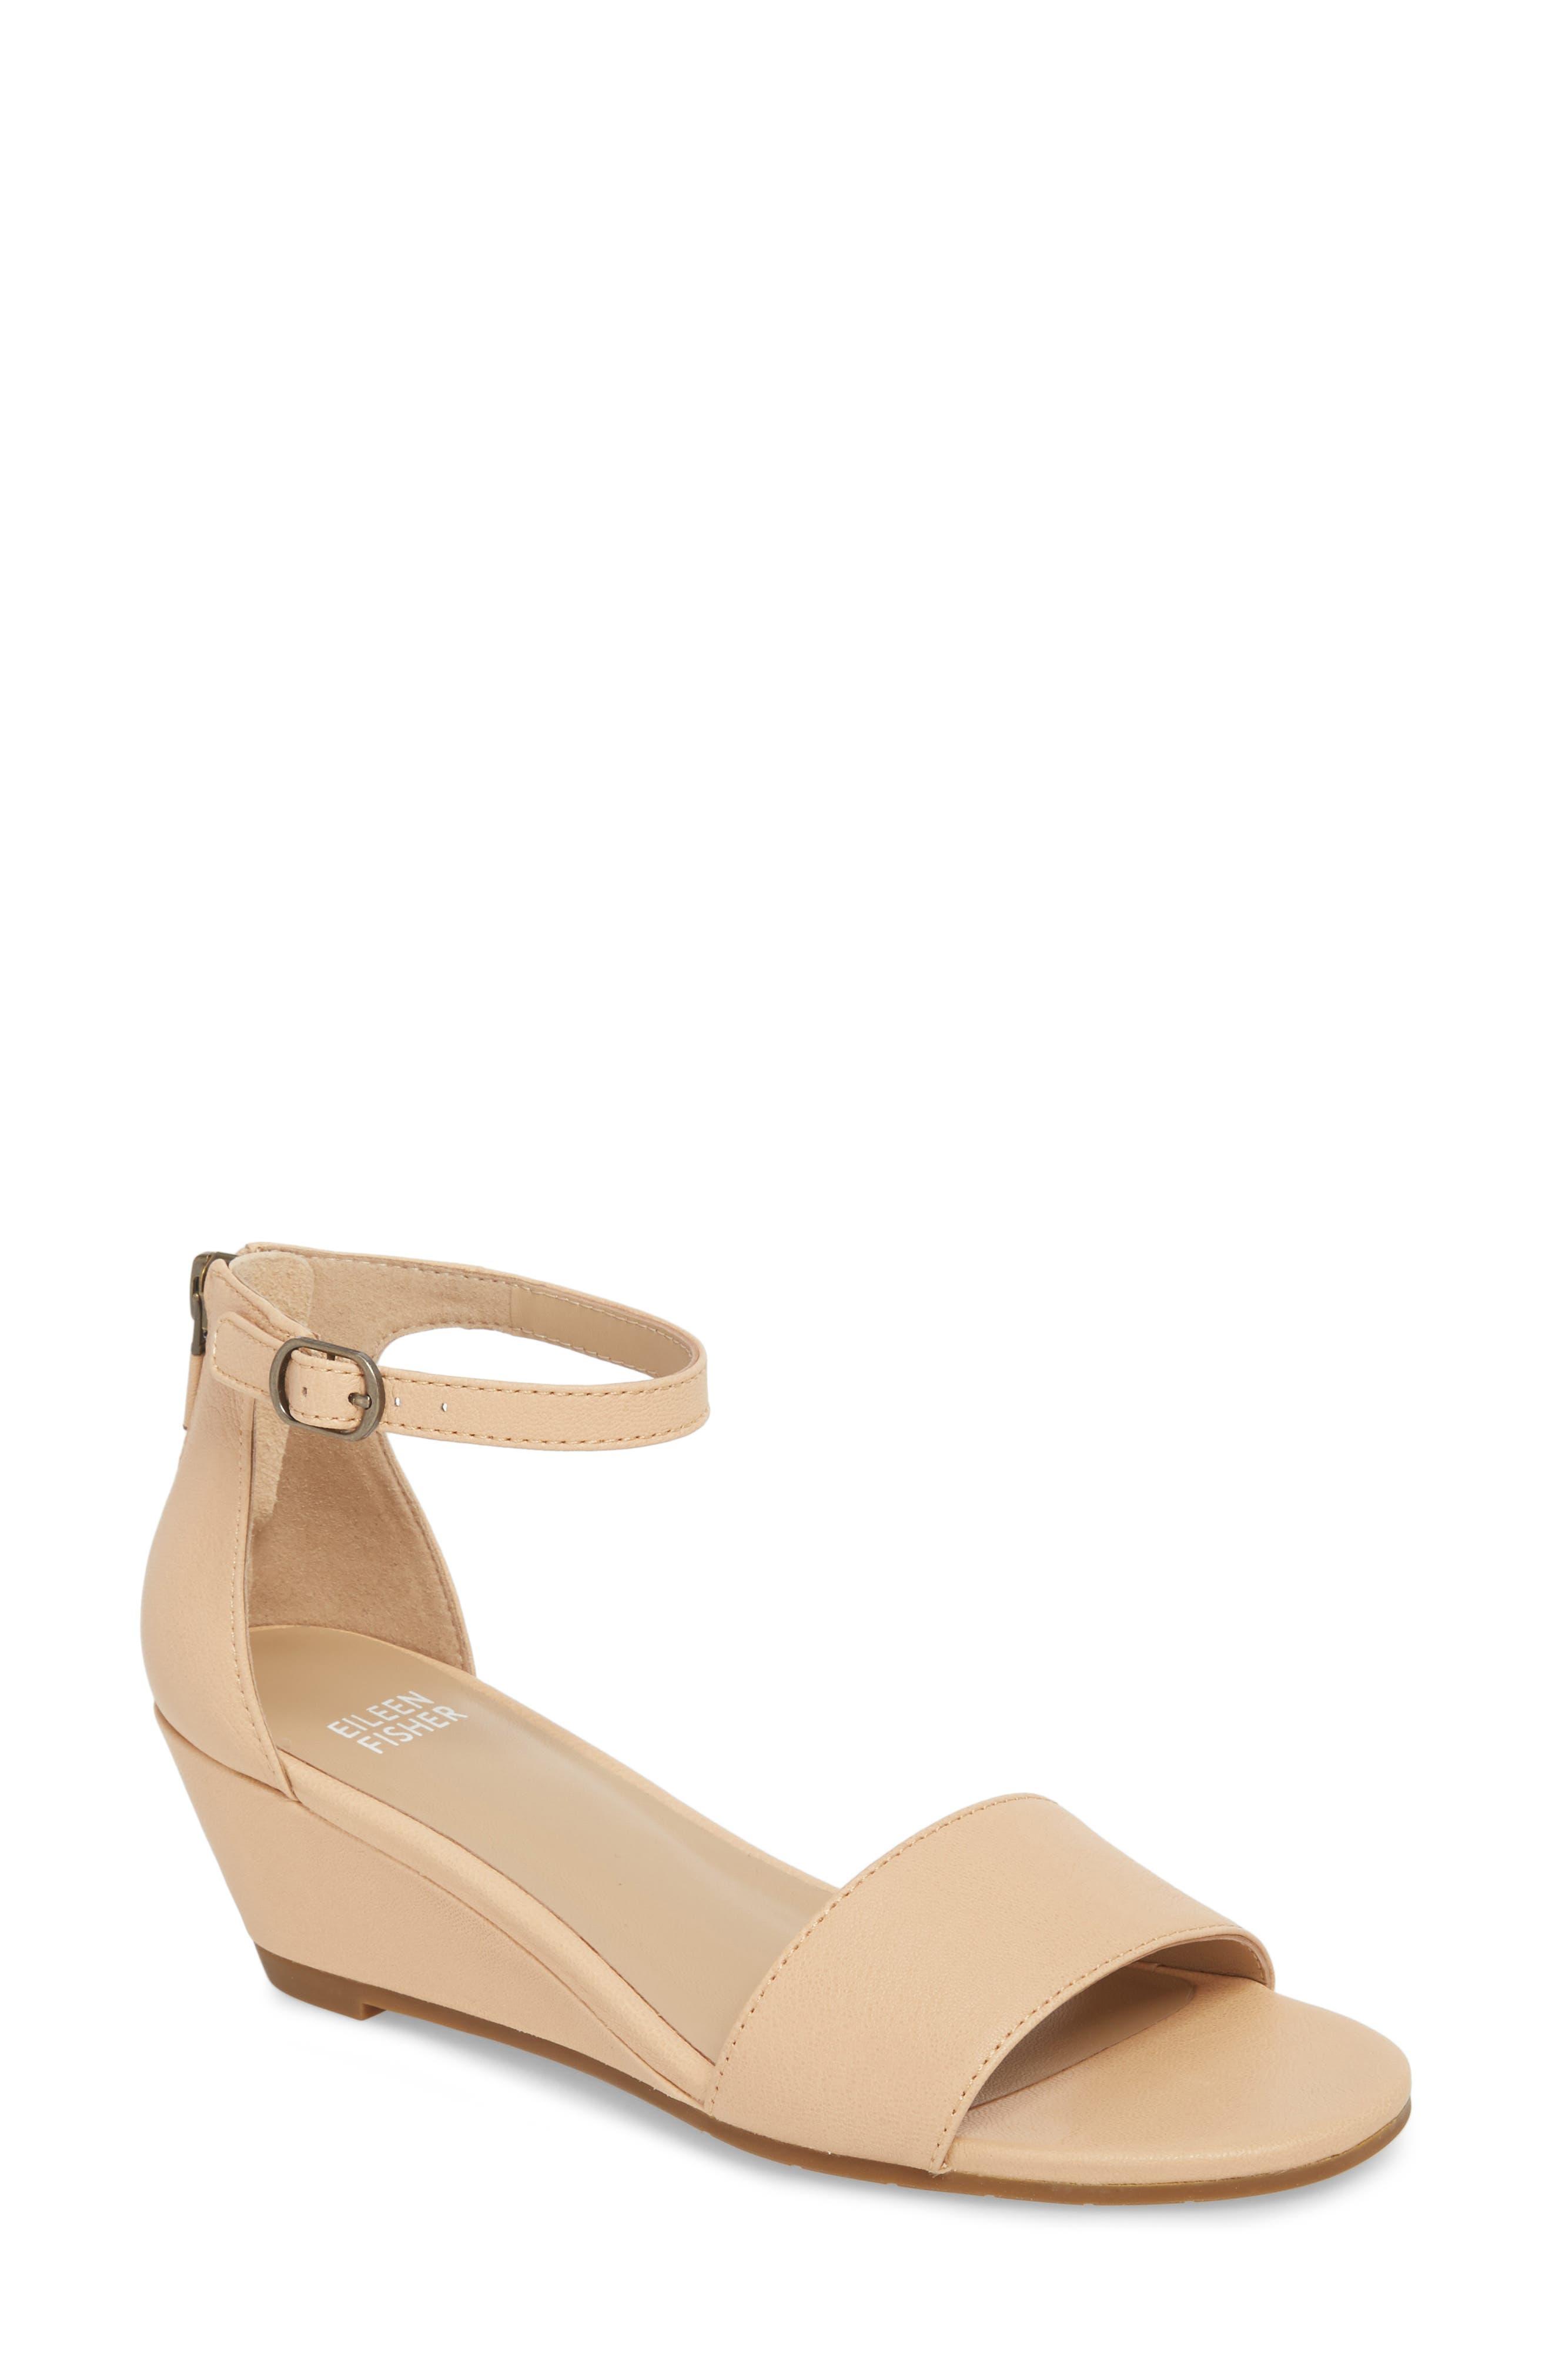 Mara Ankle Strap Wedge Sandal,                             Main thumbnail 2, color,